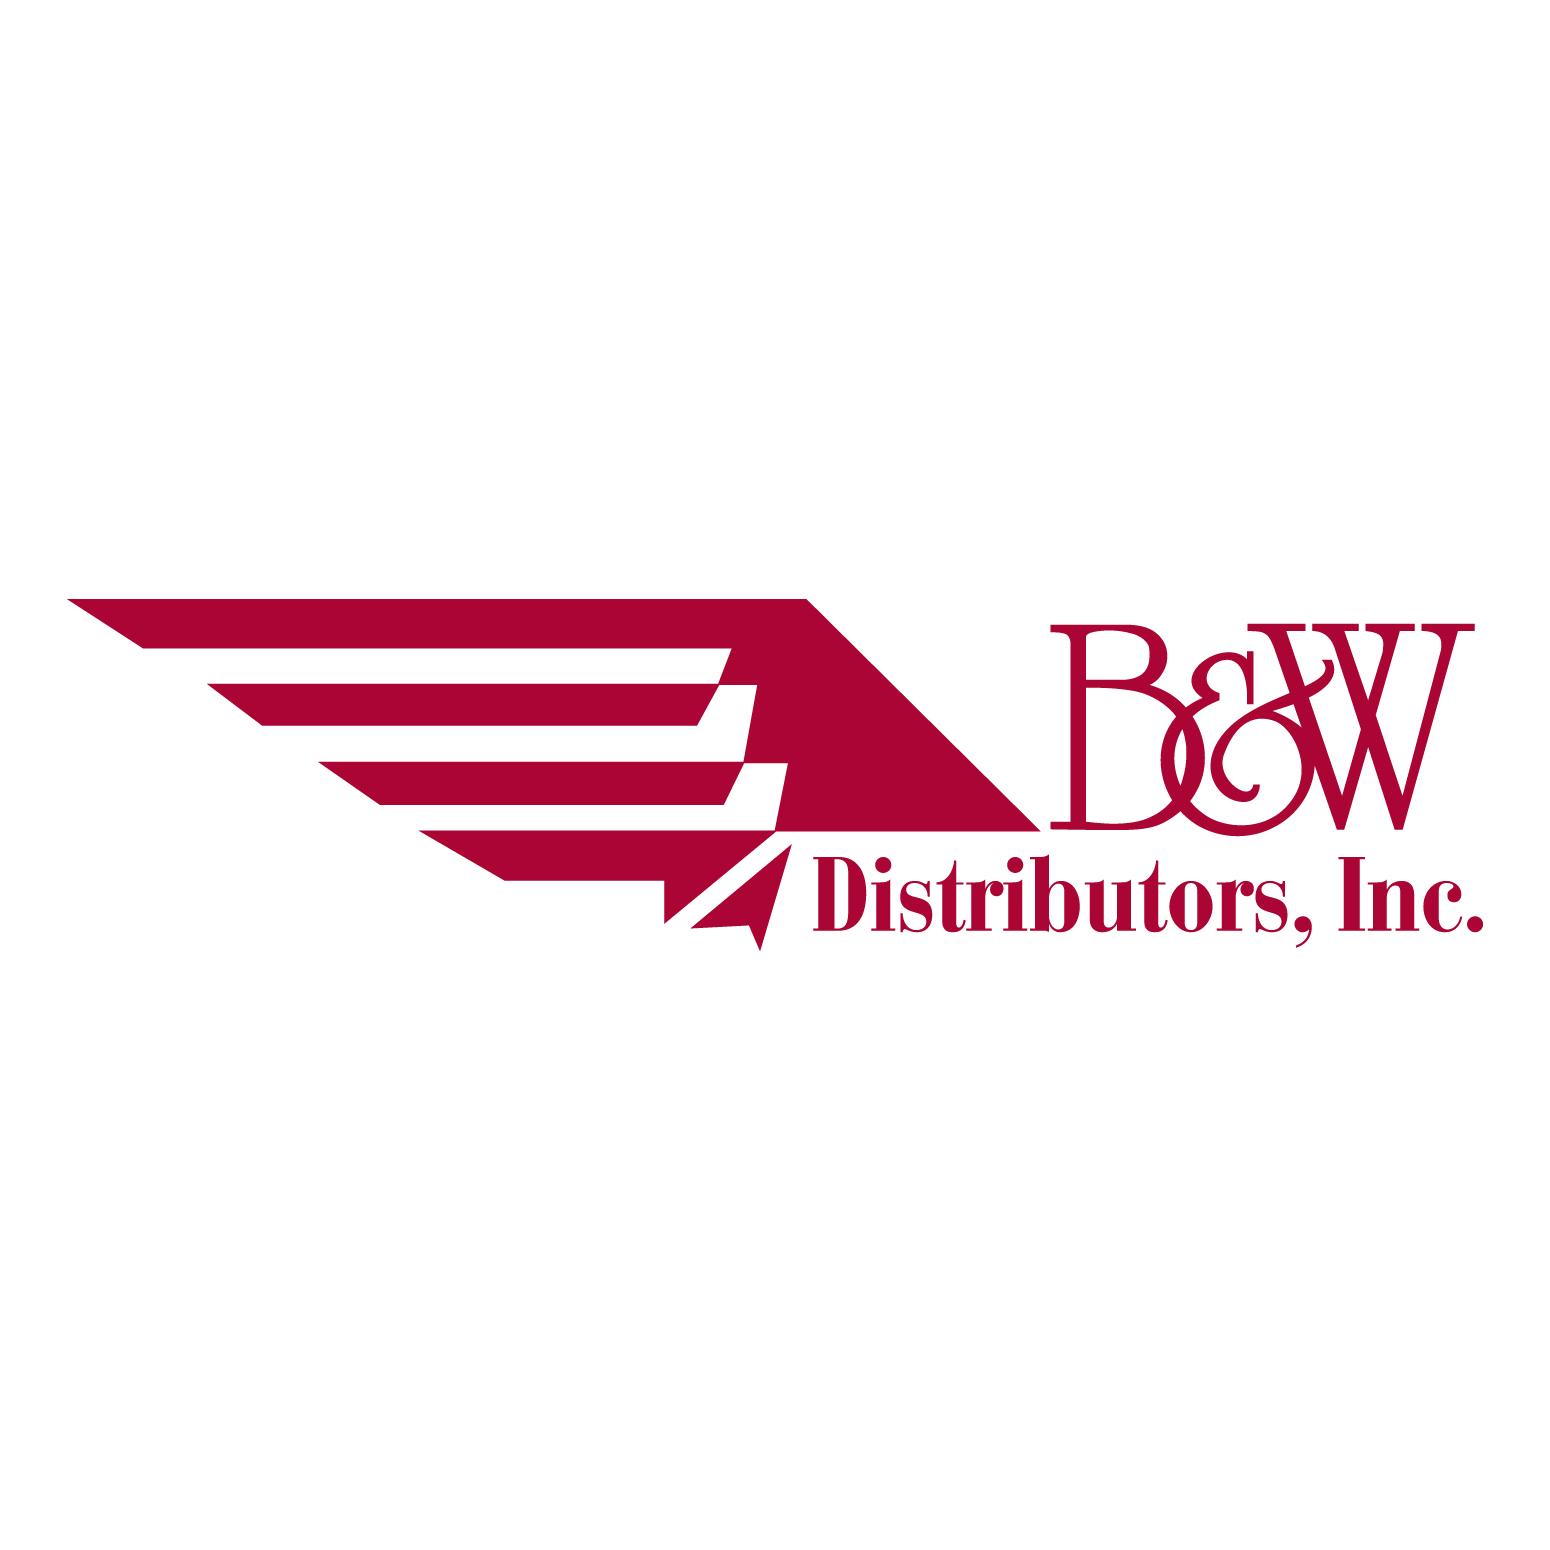 B&W Distributors, Inc.